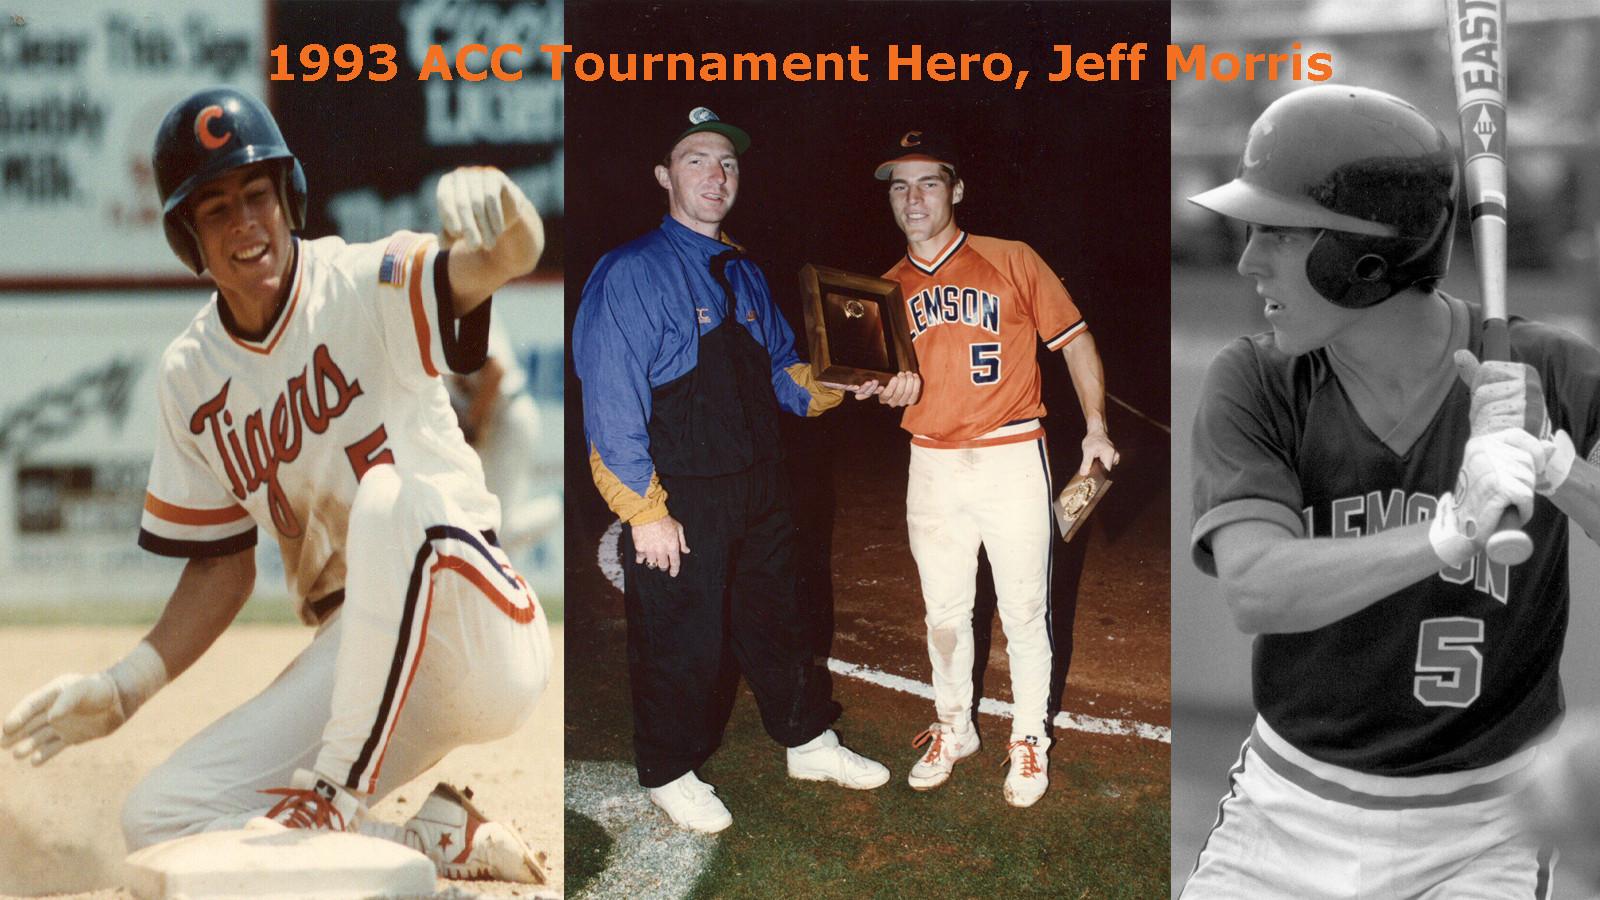 CLEMSON VAULT: Jeff Morris and the 1993 ACC Baseball Tournament